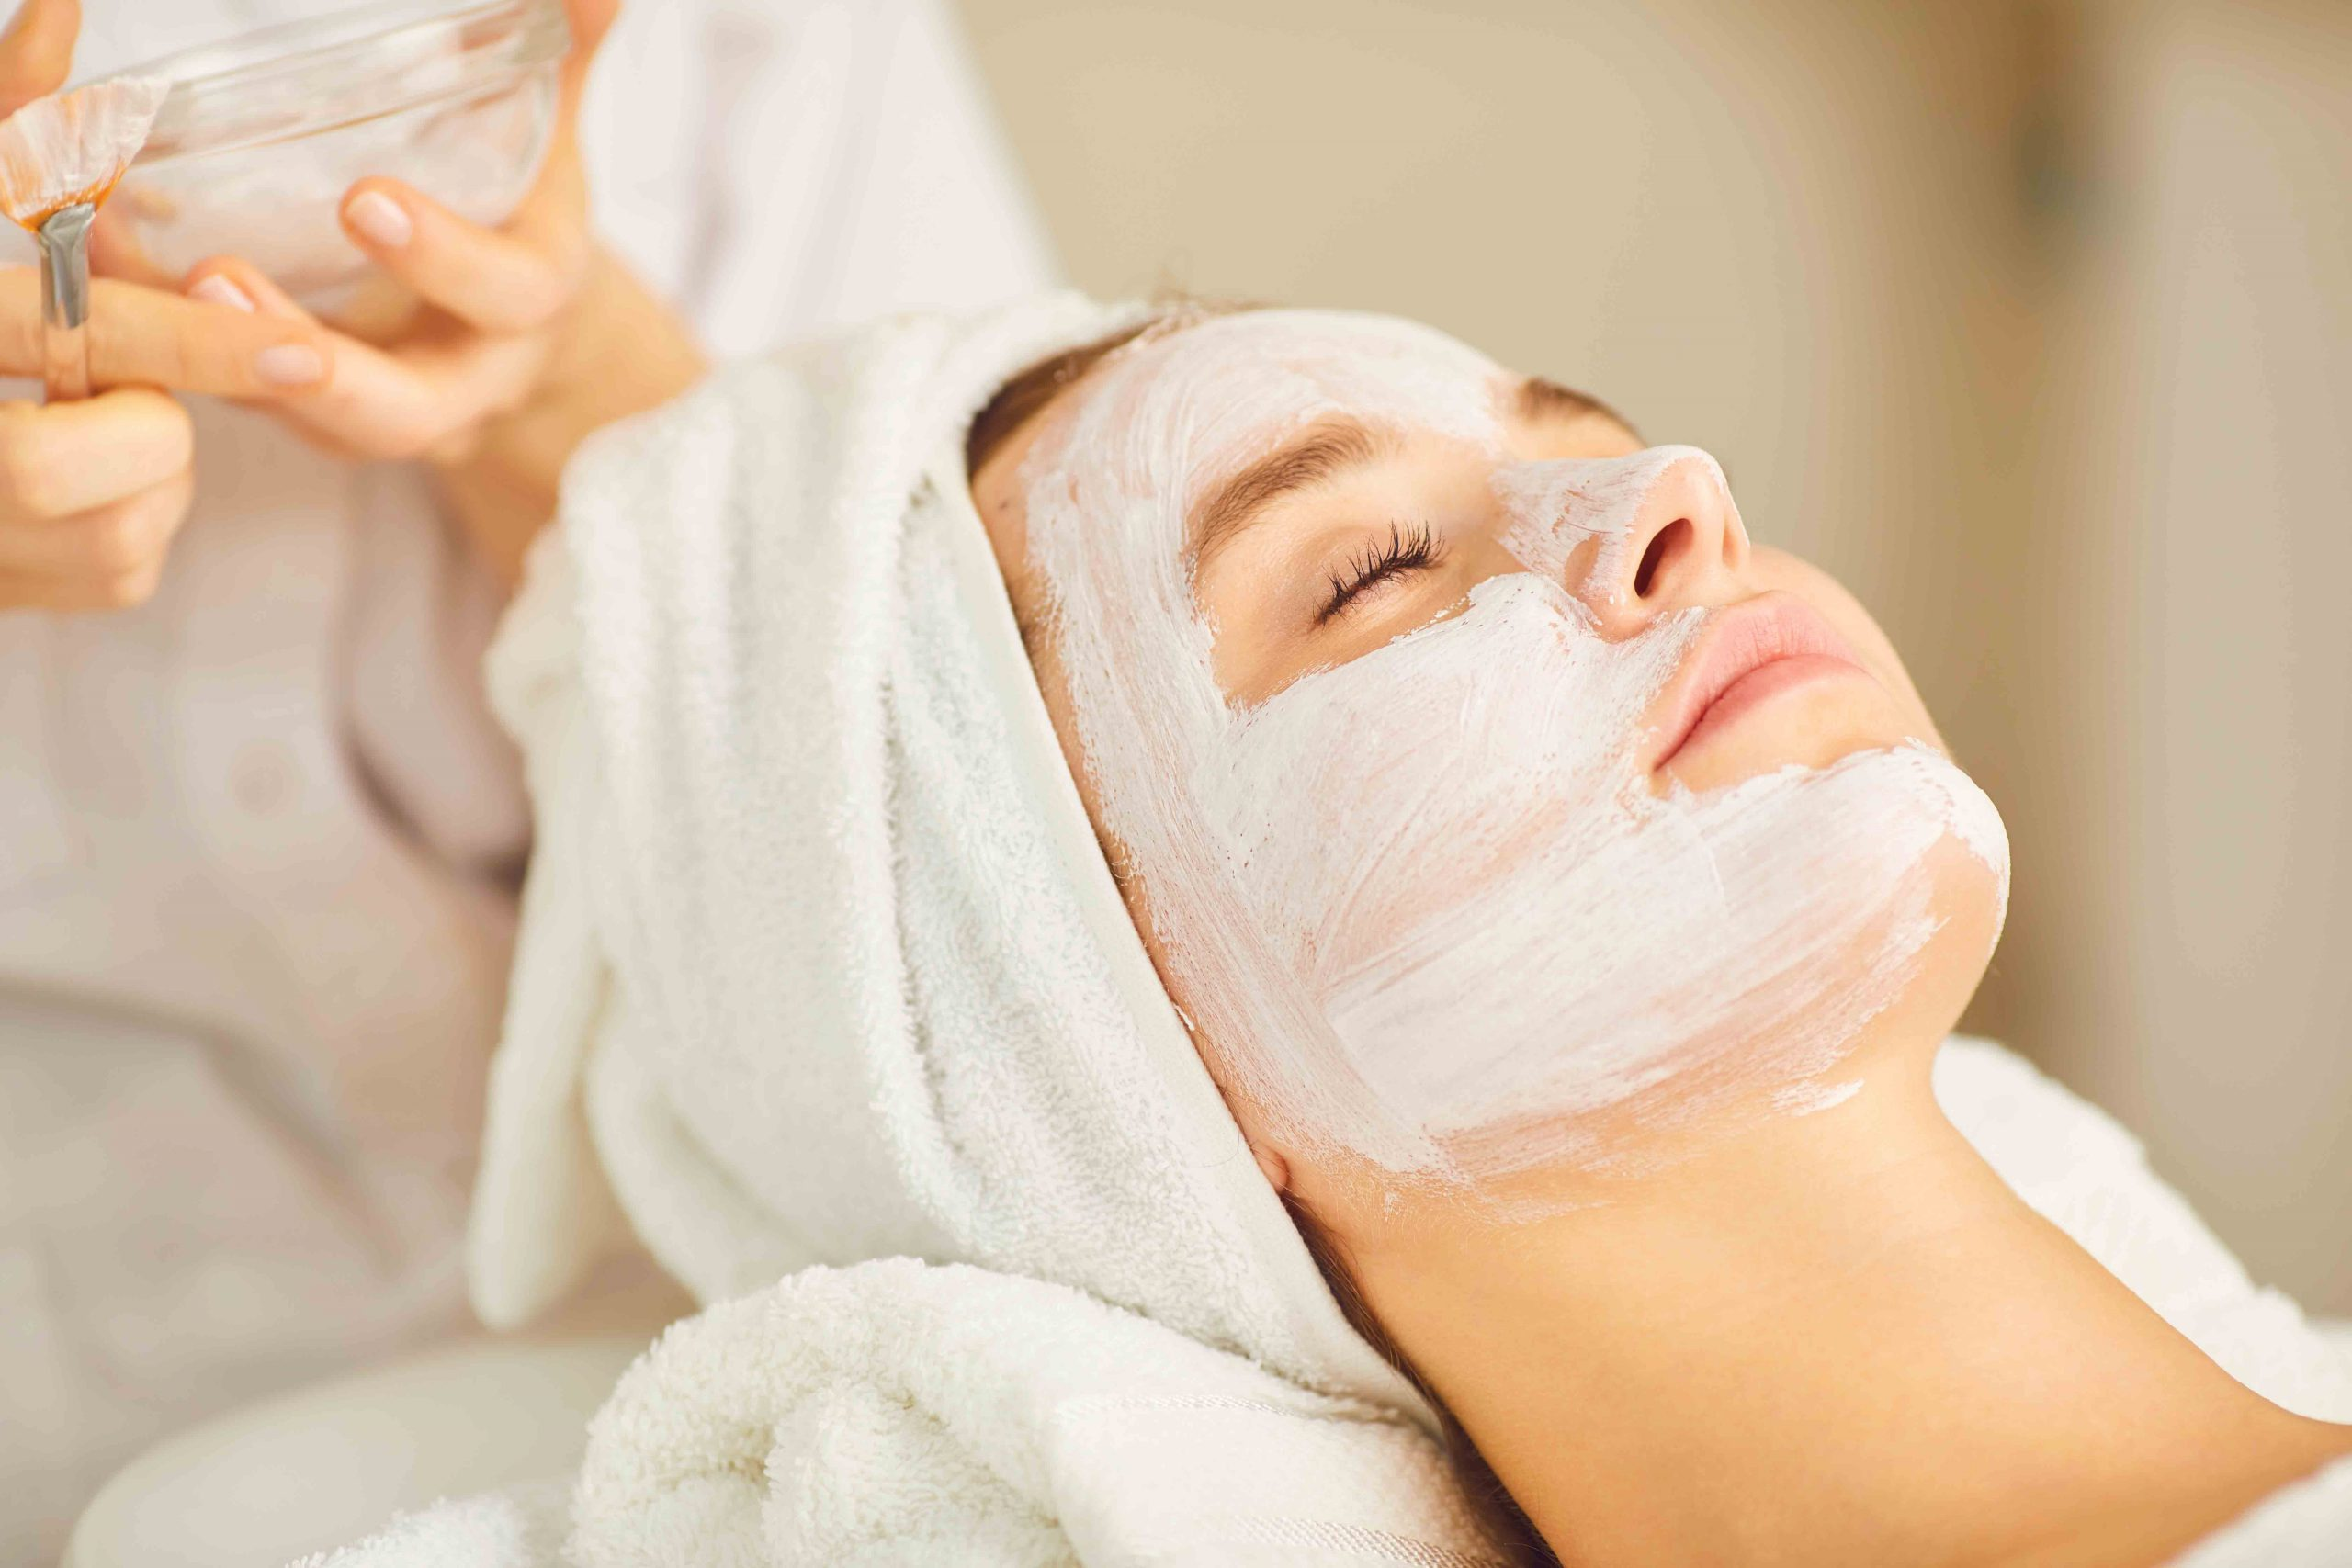 Frau erhält ein Gesichts-Peeling / Peeling / Dr. Zierhofer-Tonar, 1010 Wien